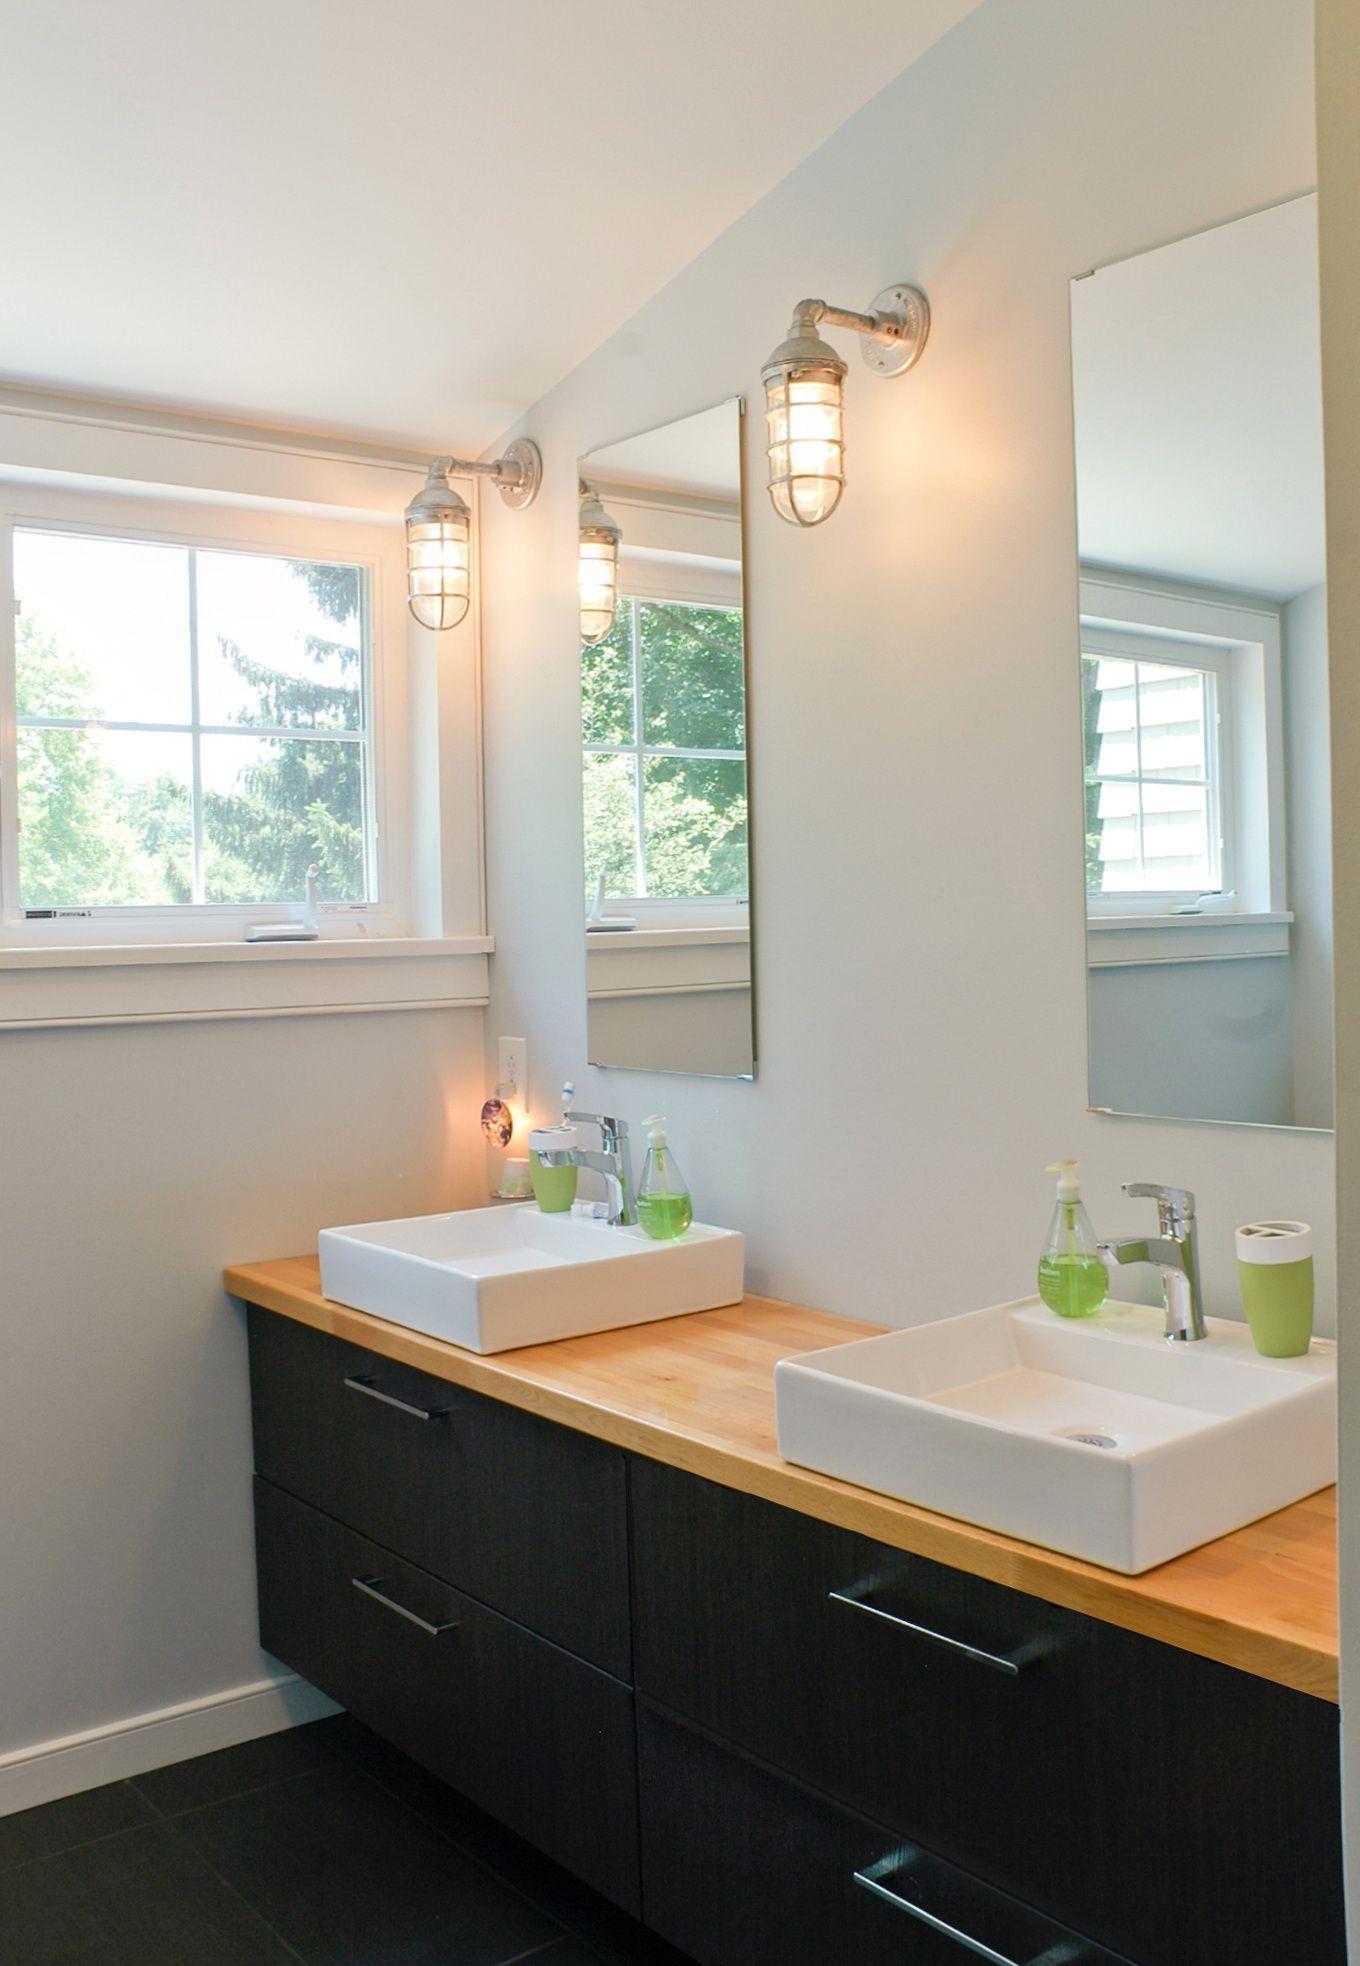 ikea bathroom vanity hack badezimmer badezimmer deko on ikea bathroom vanities id=35480